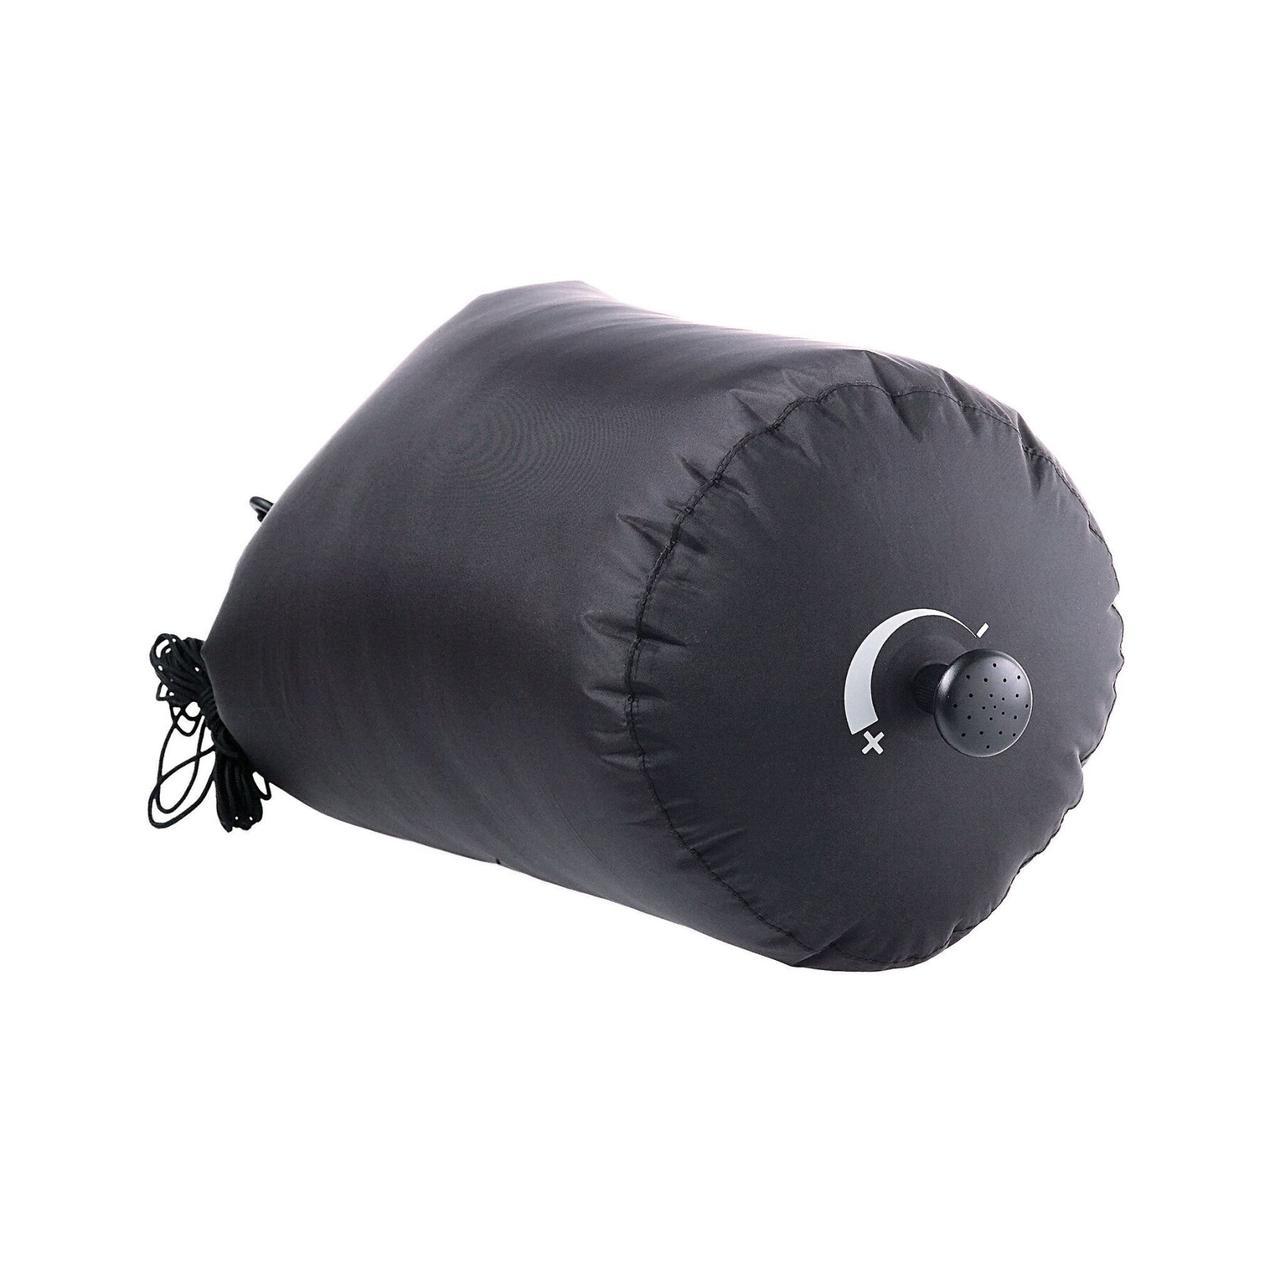 Душ переносной Sea To Summit - Pocket Shower Black, 10 л (STS APSHOWER)